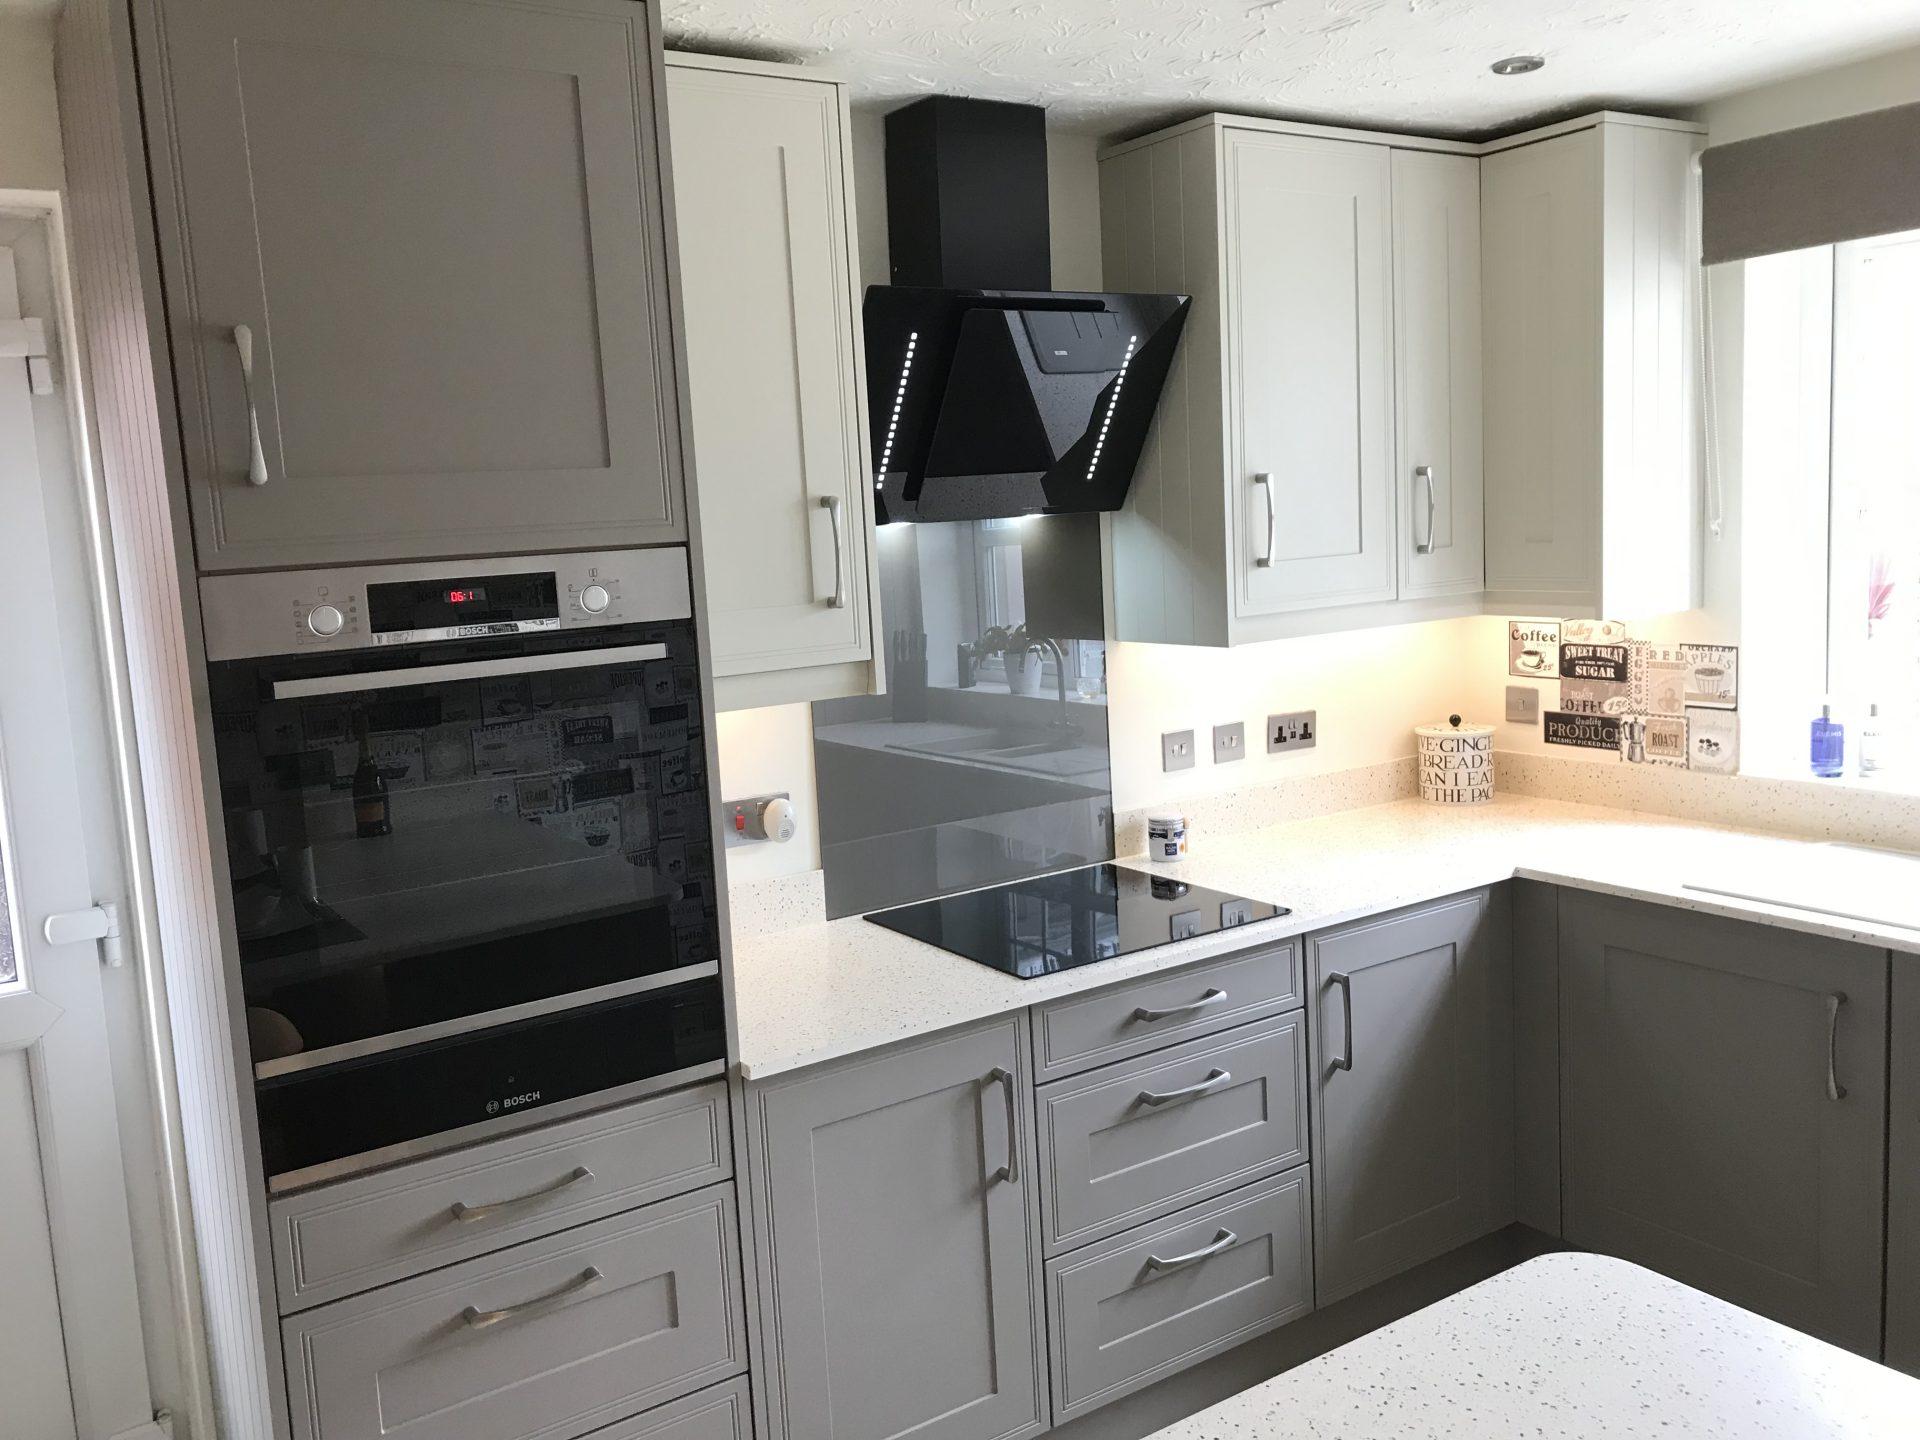 Classic Tulley Kitchen Design Installation - Shropshire